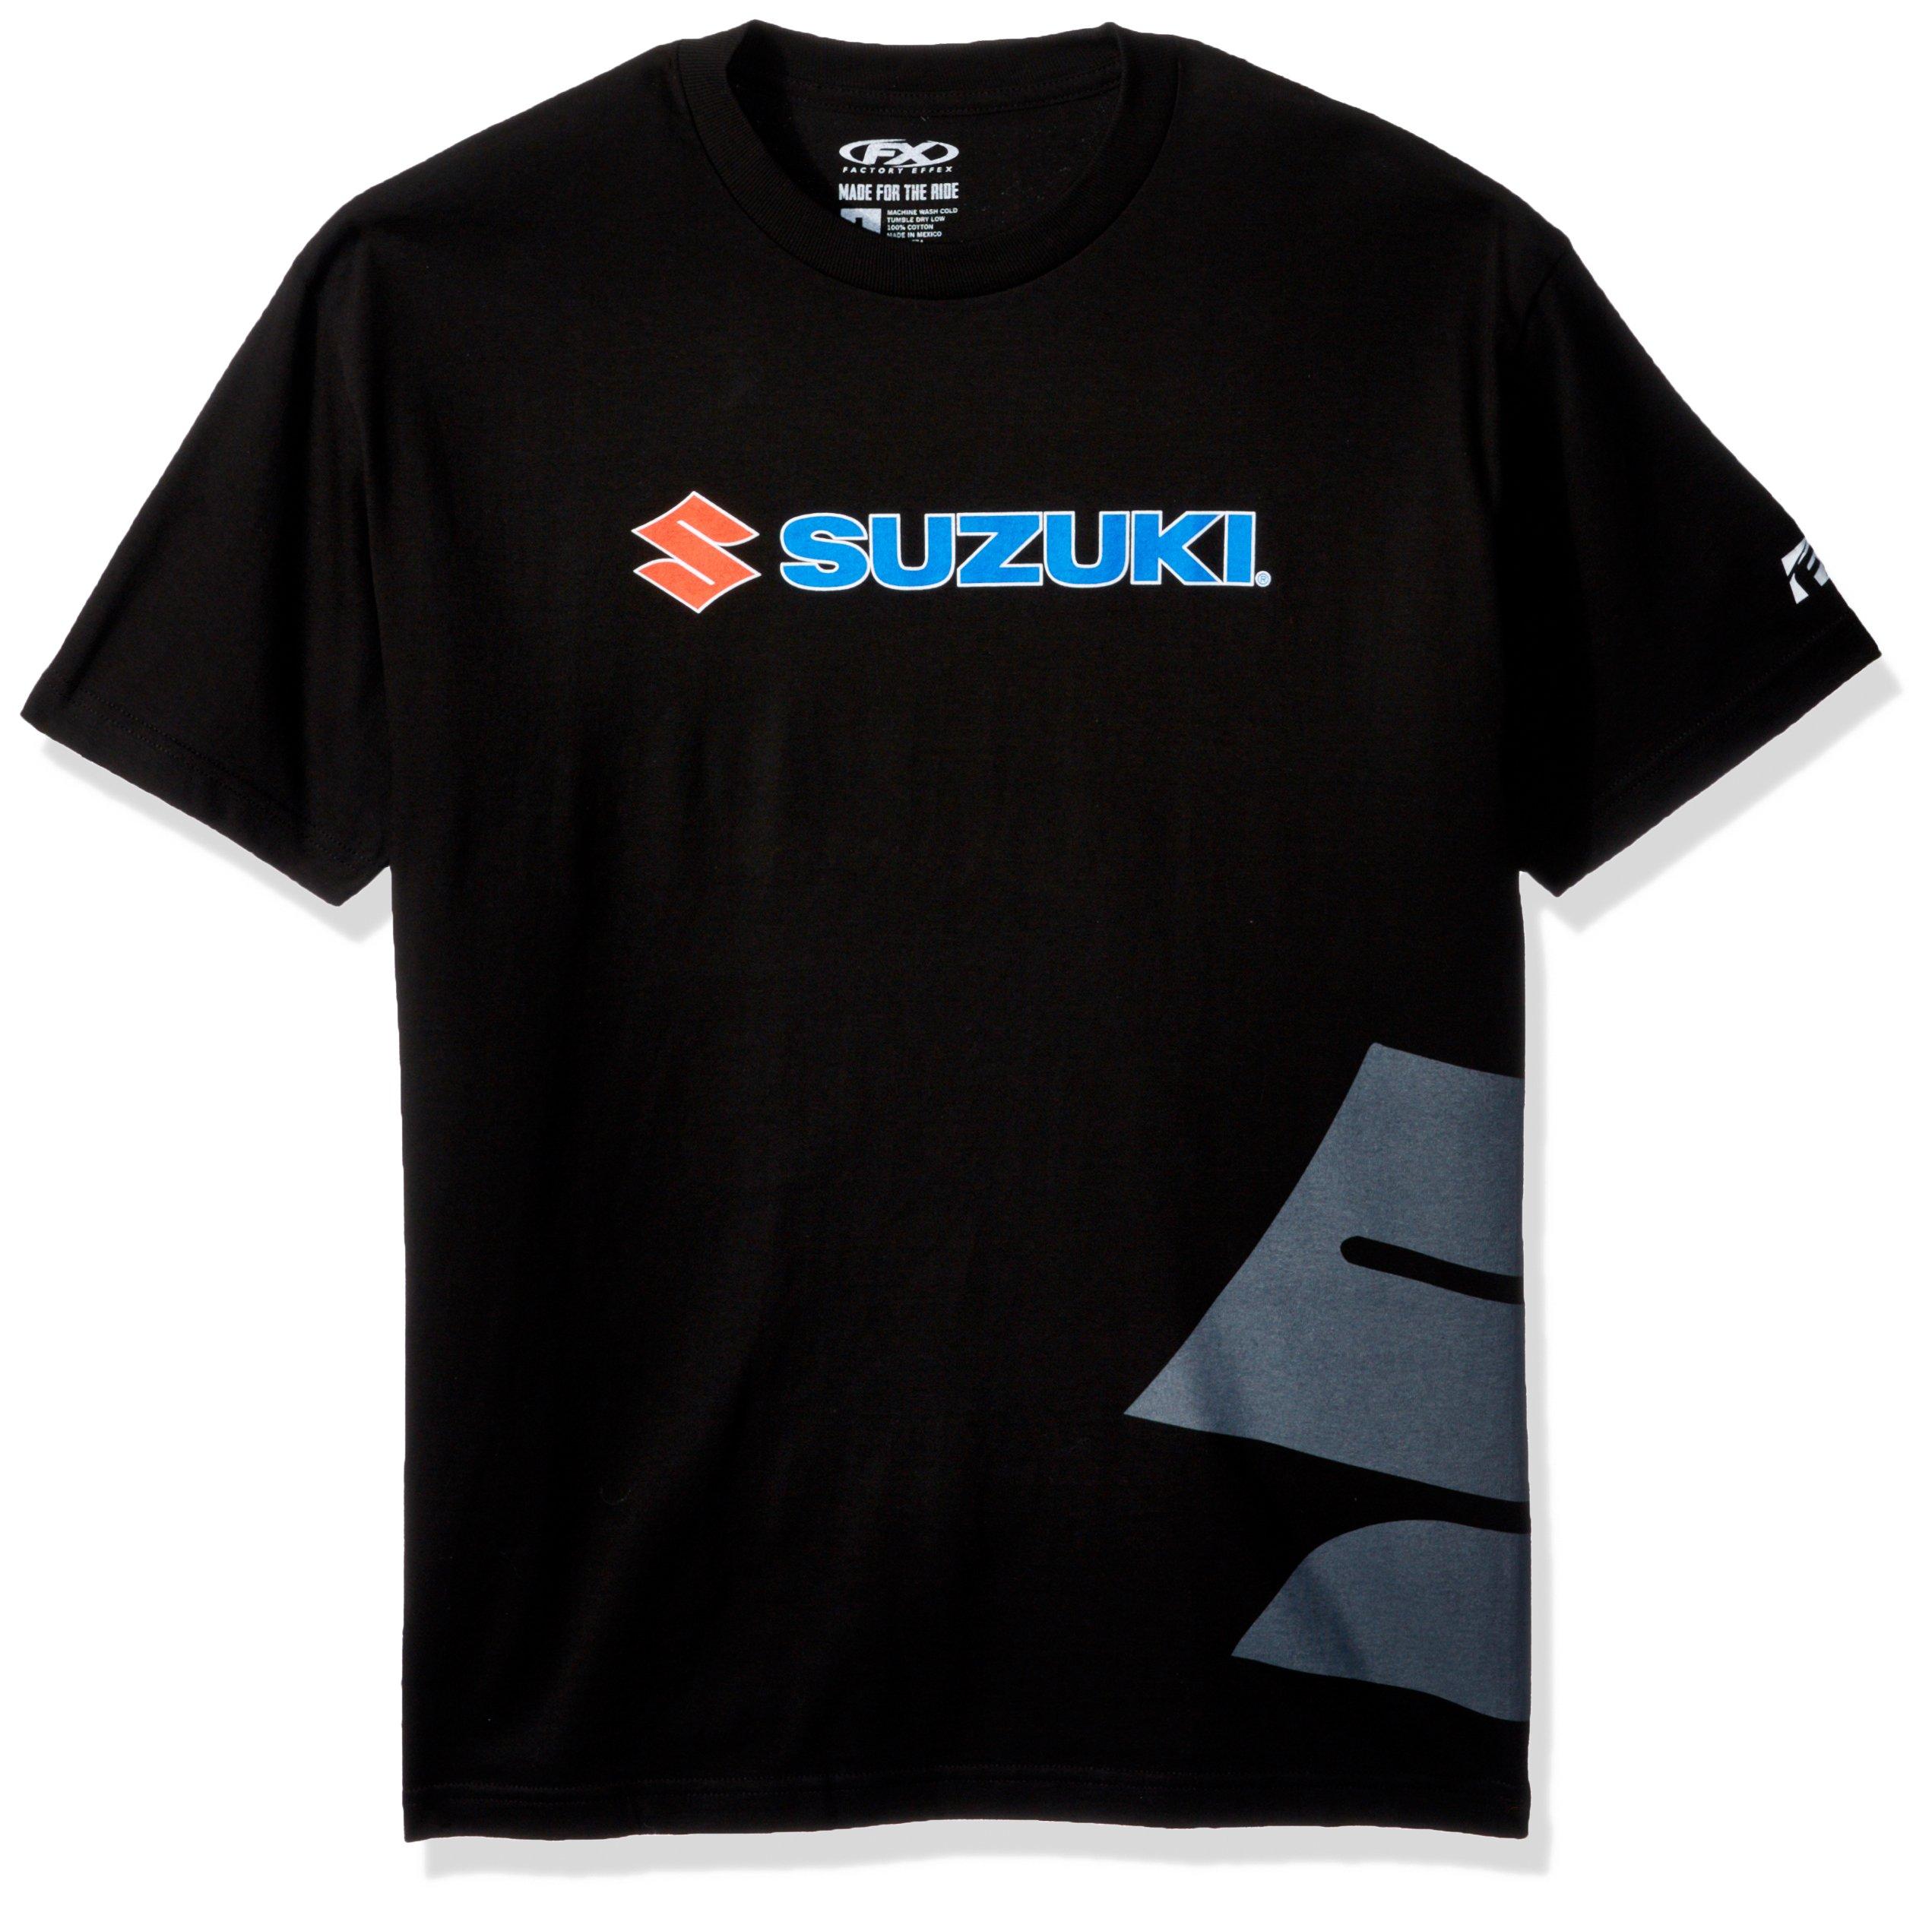 Factory Effex 15-88472 Suzuki Big 'S' T-Shirt